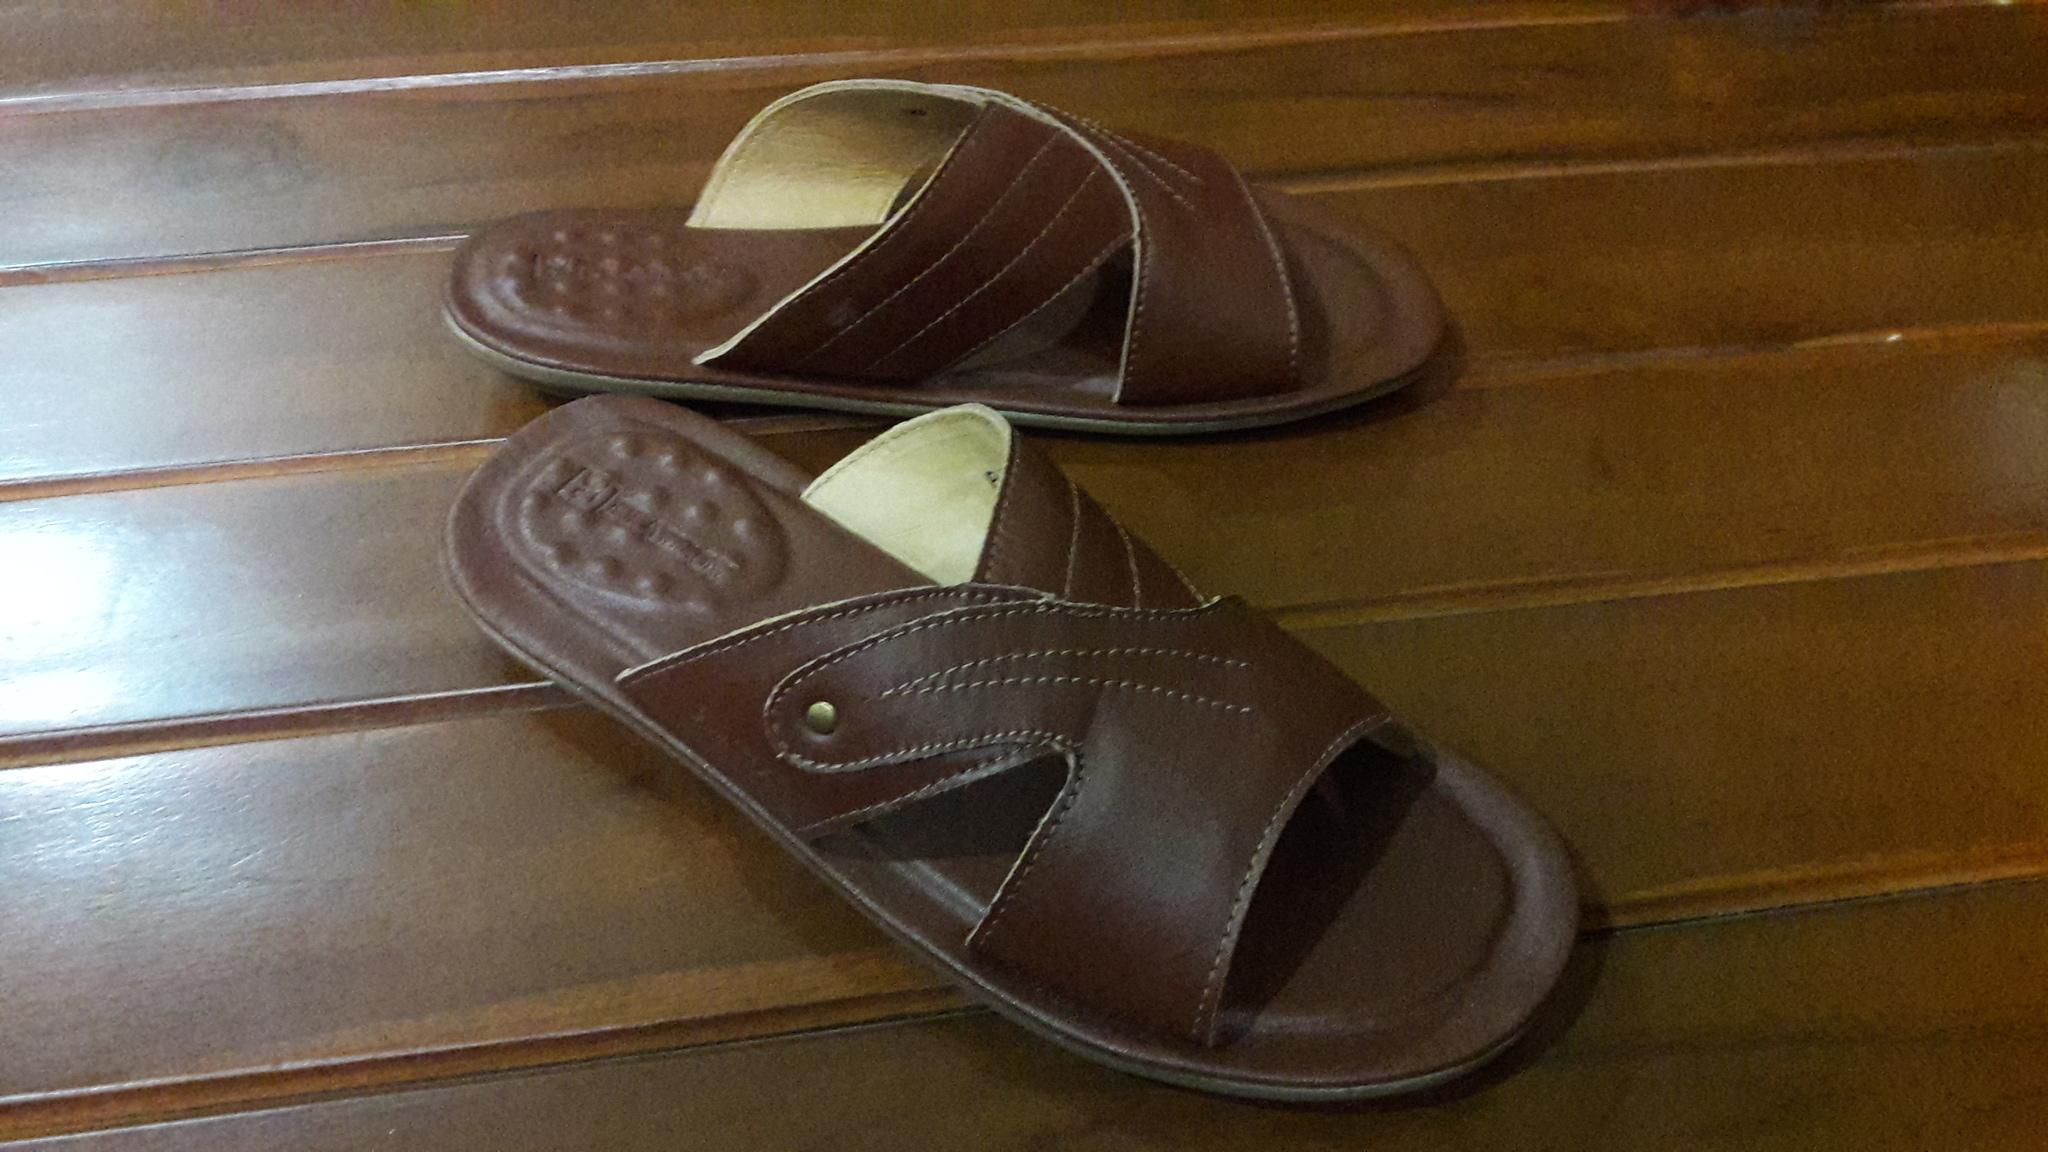 Sendal / Sandal Kulit Import Merk Playboy Original Ori Asli